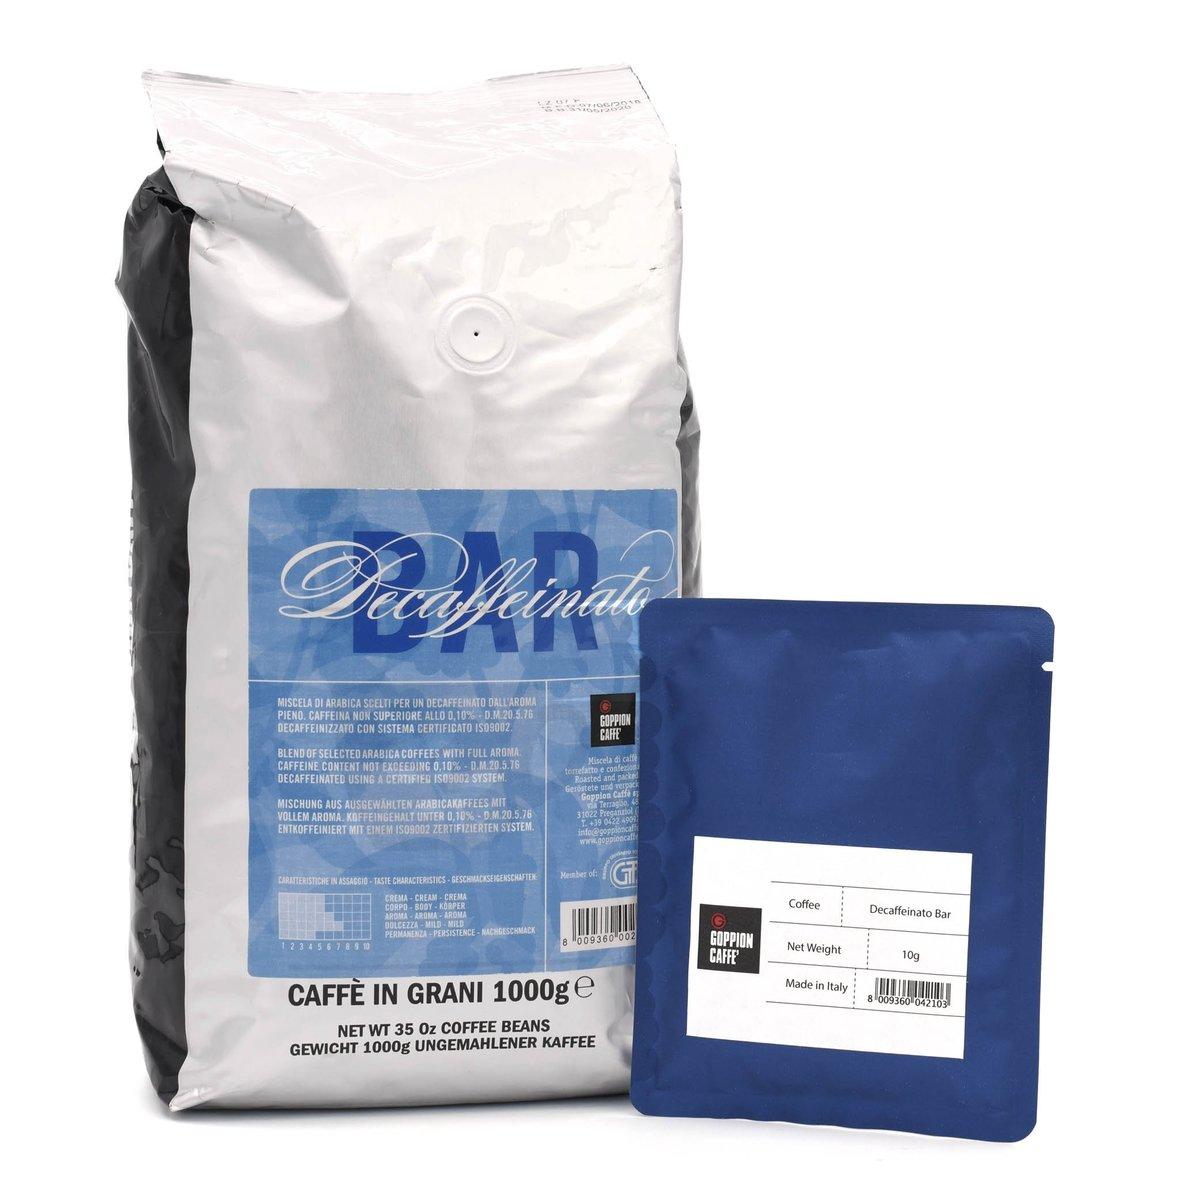 DECAFFEINATO BAR DRIP BAG COFFEE x 5pcs